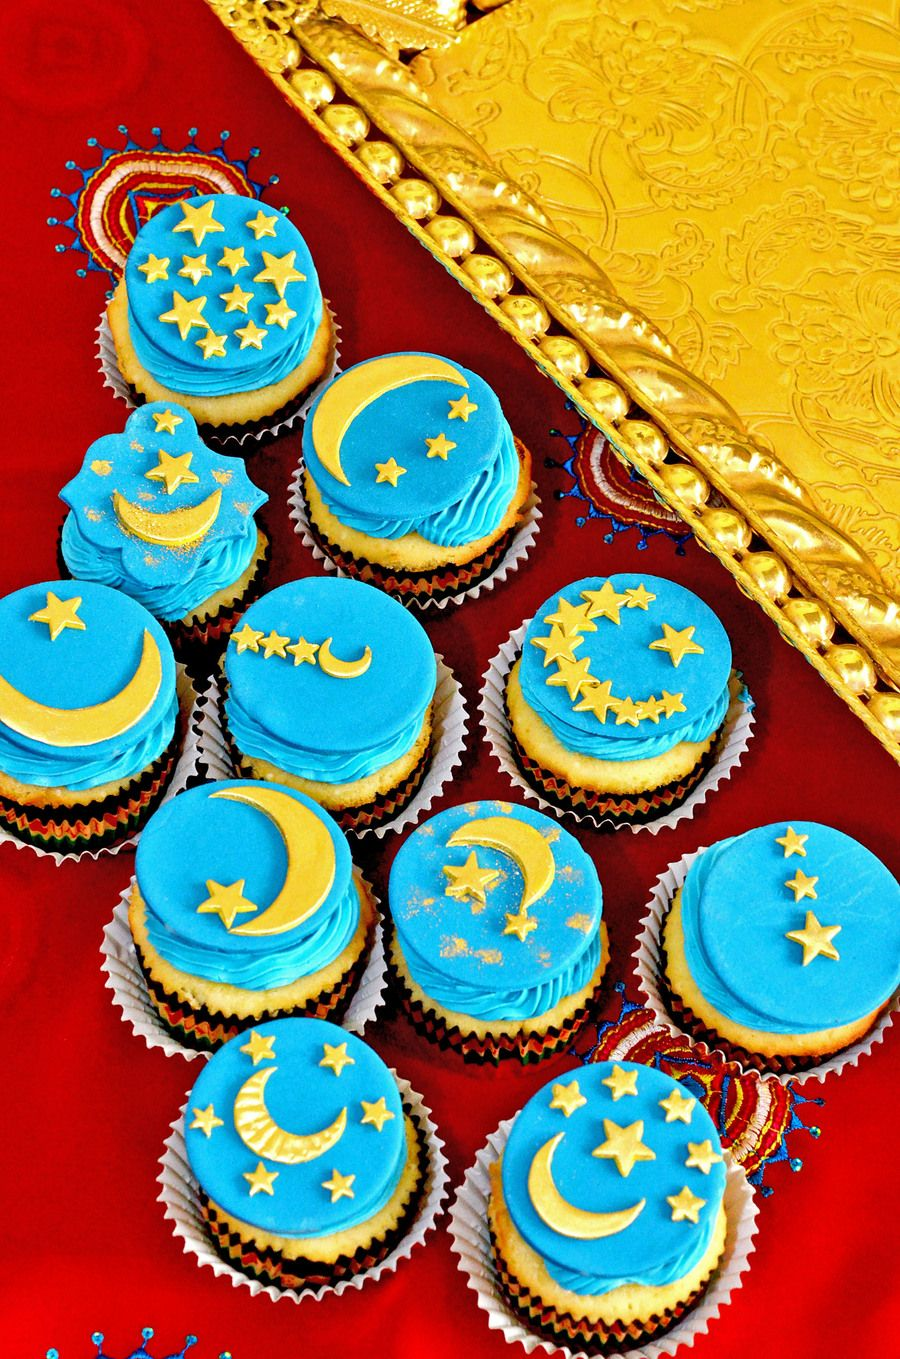 Cake Designs For Ramadan : Ramadan cupcakes my cakes Pinterest Ramadan, Cupcake ...